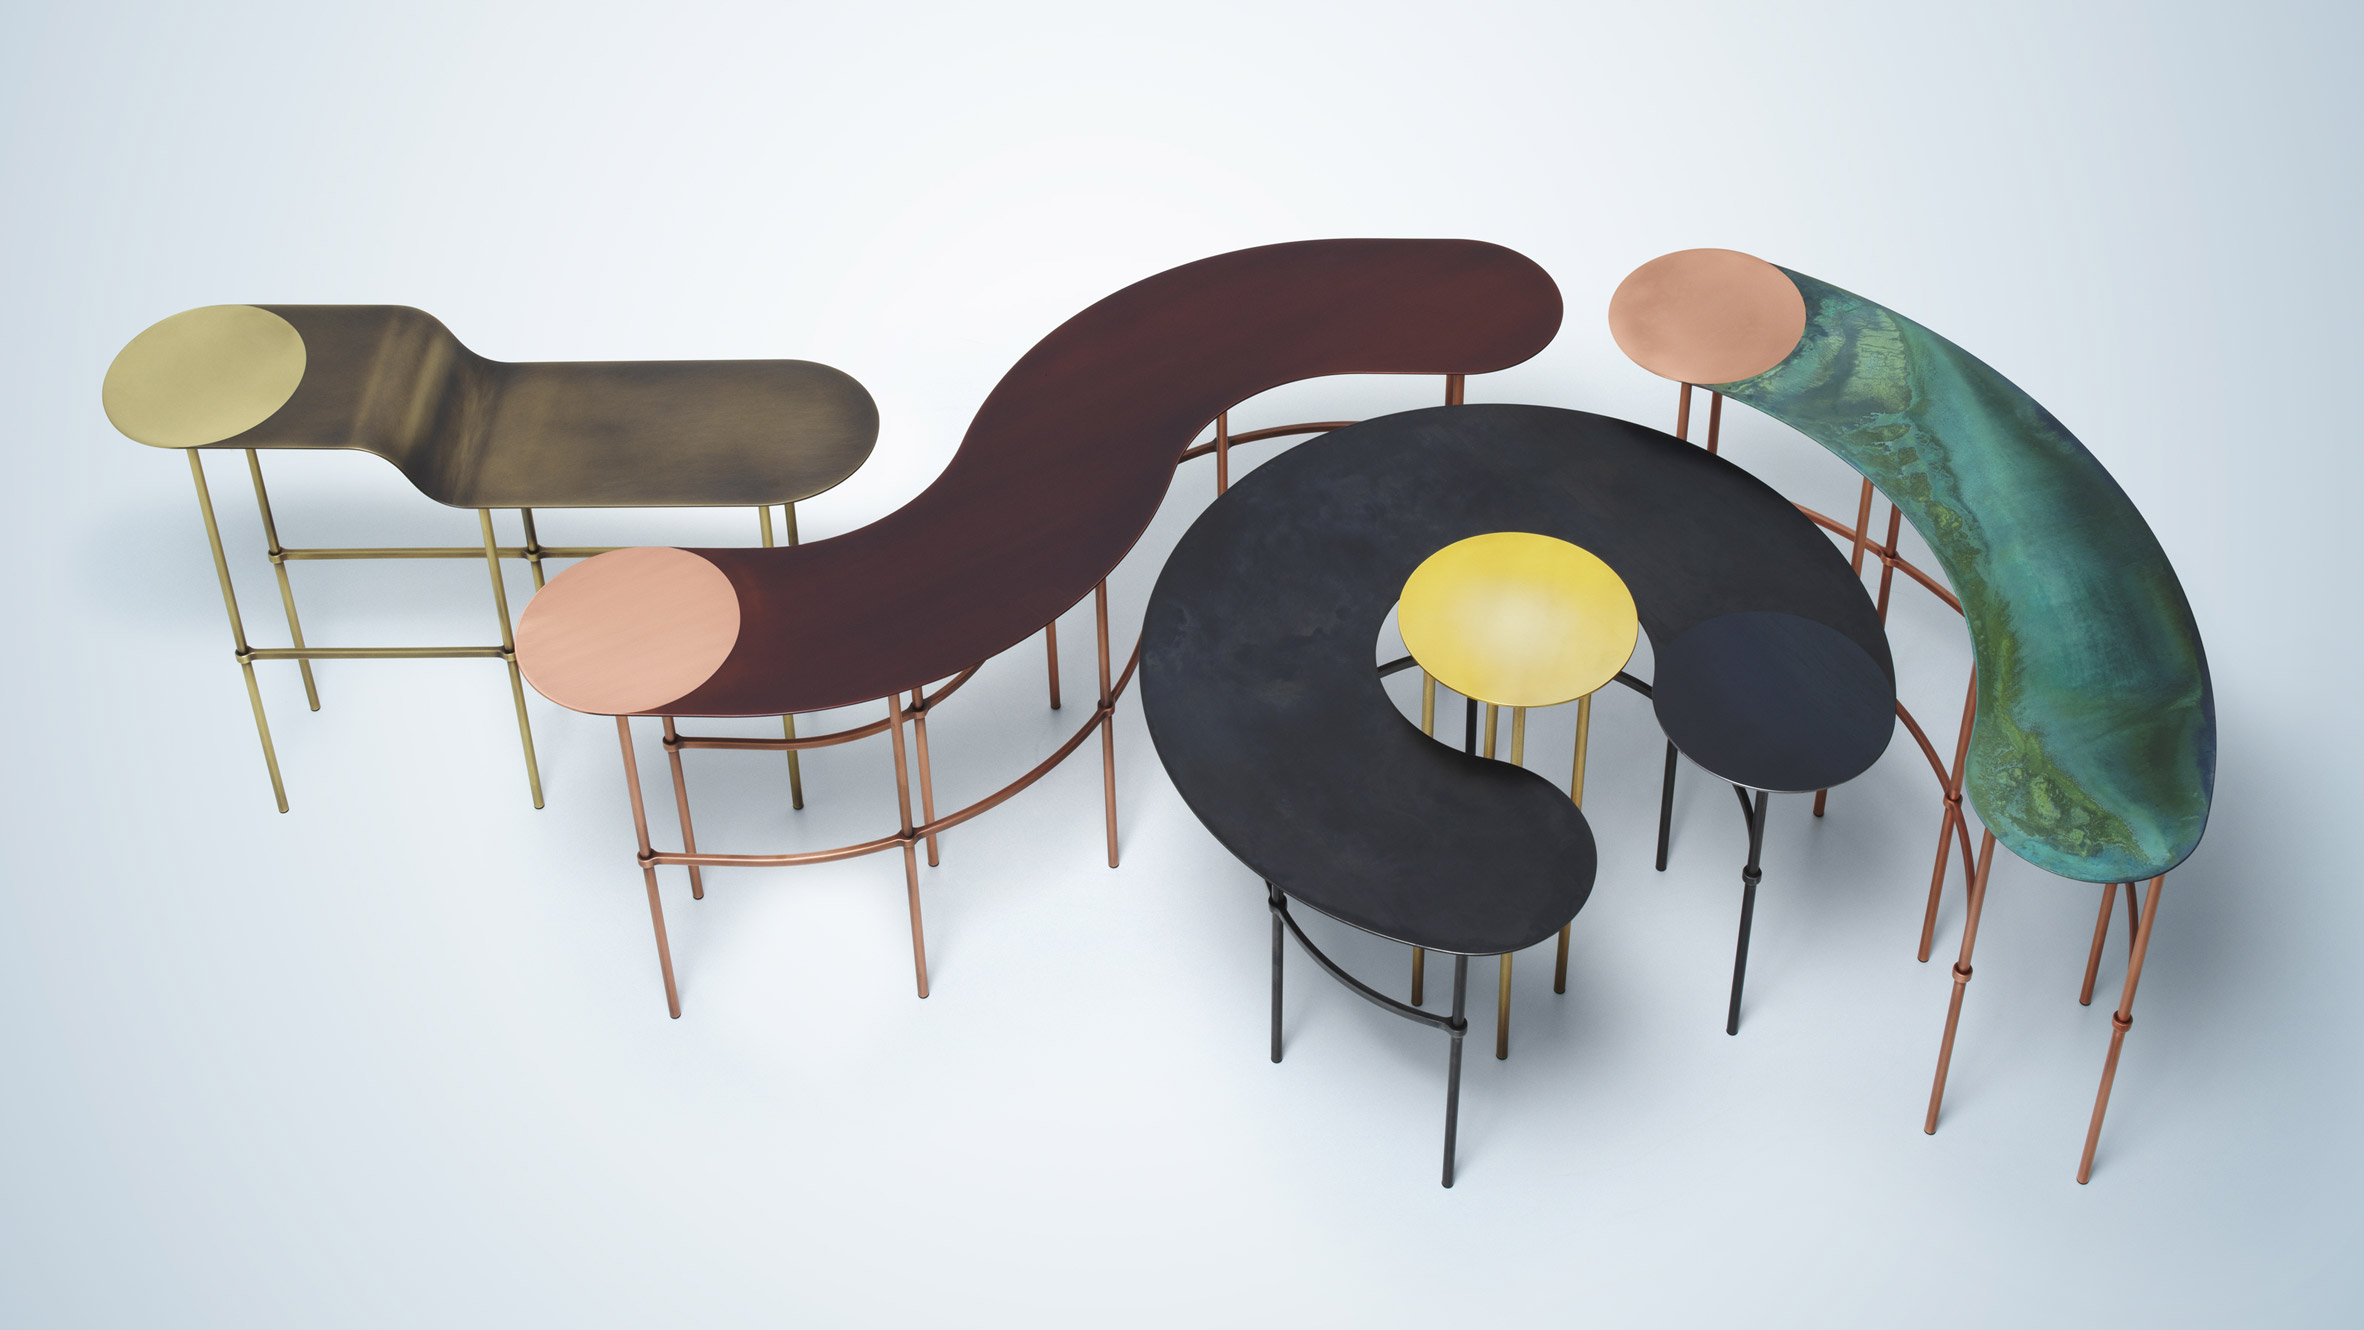 tracing-identity-milan-design-week-furniture_dezeen_lanzavecchia_scribble_hero-d